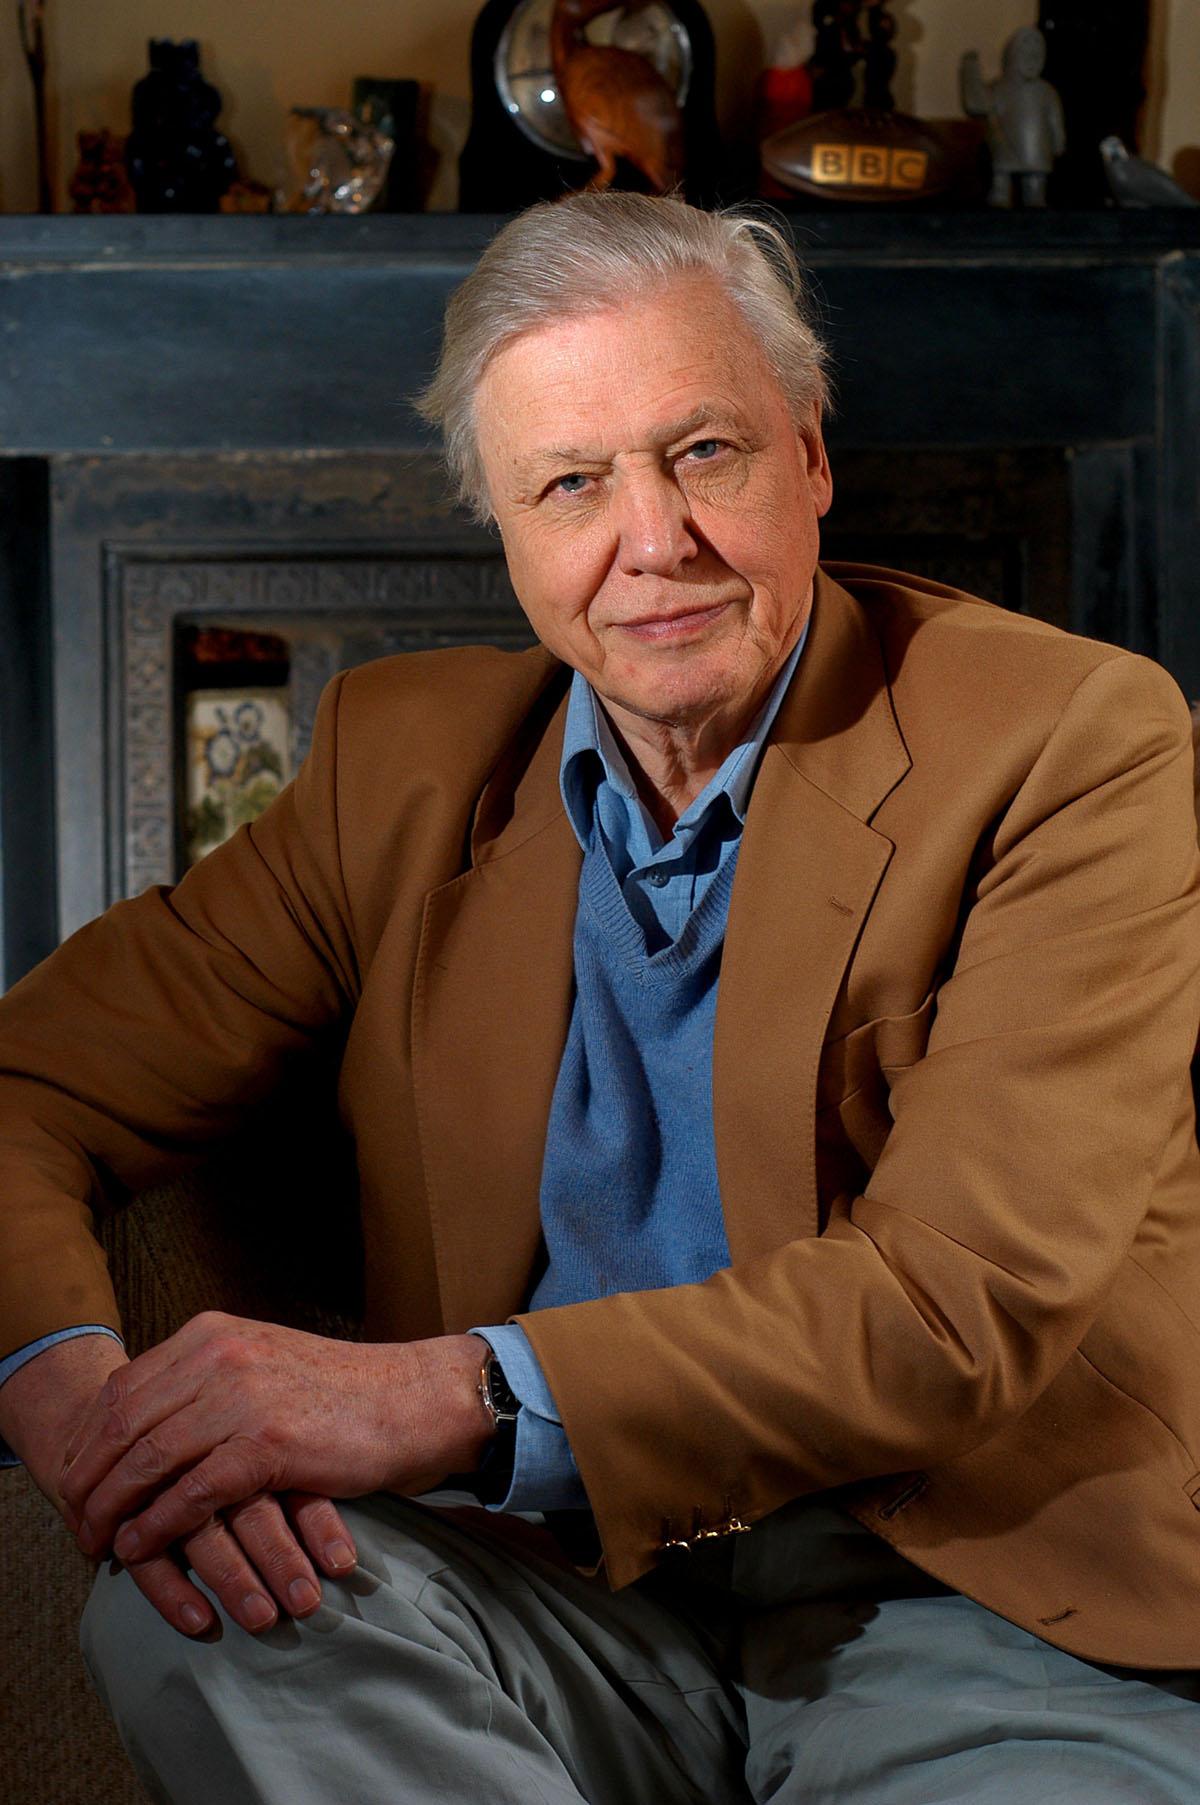 David Attenborough, Press Photographer in Bristol